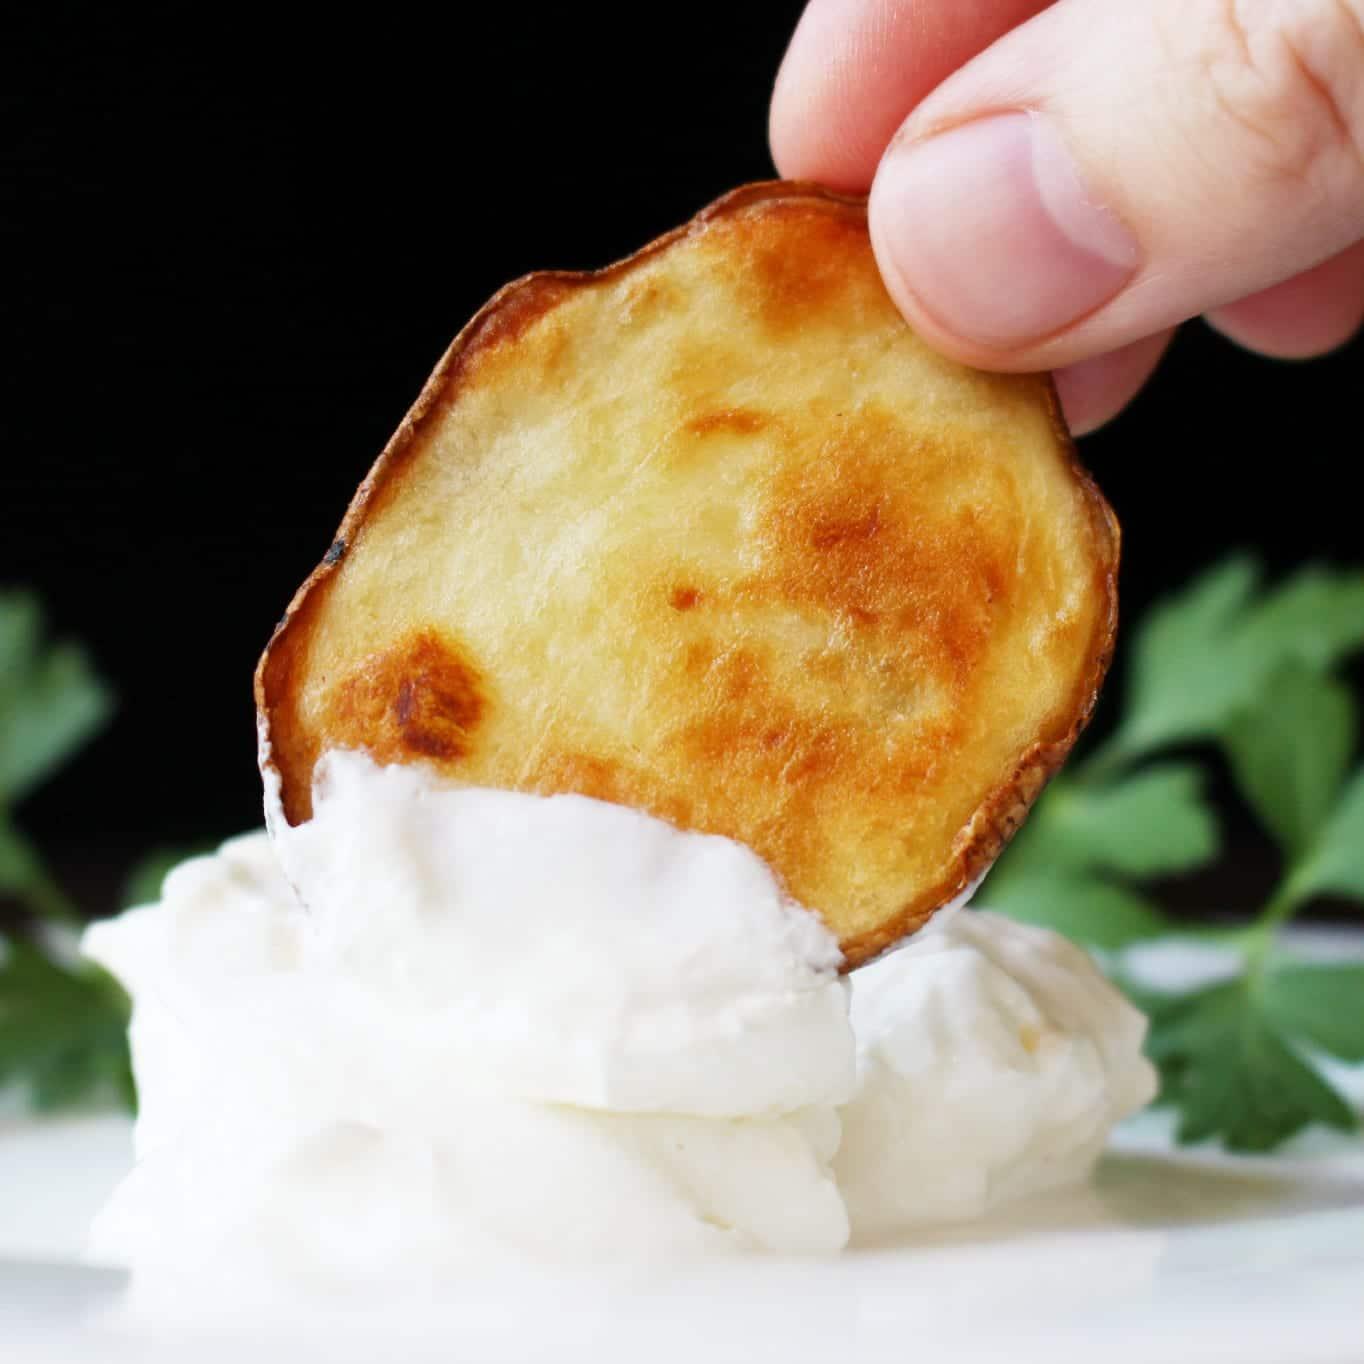 Recipes for Seniors - Oven Baked Potato Rounds